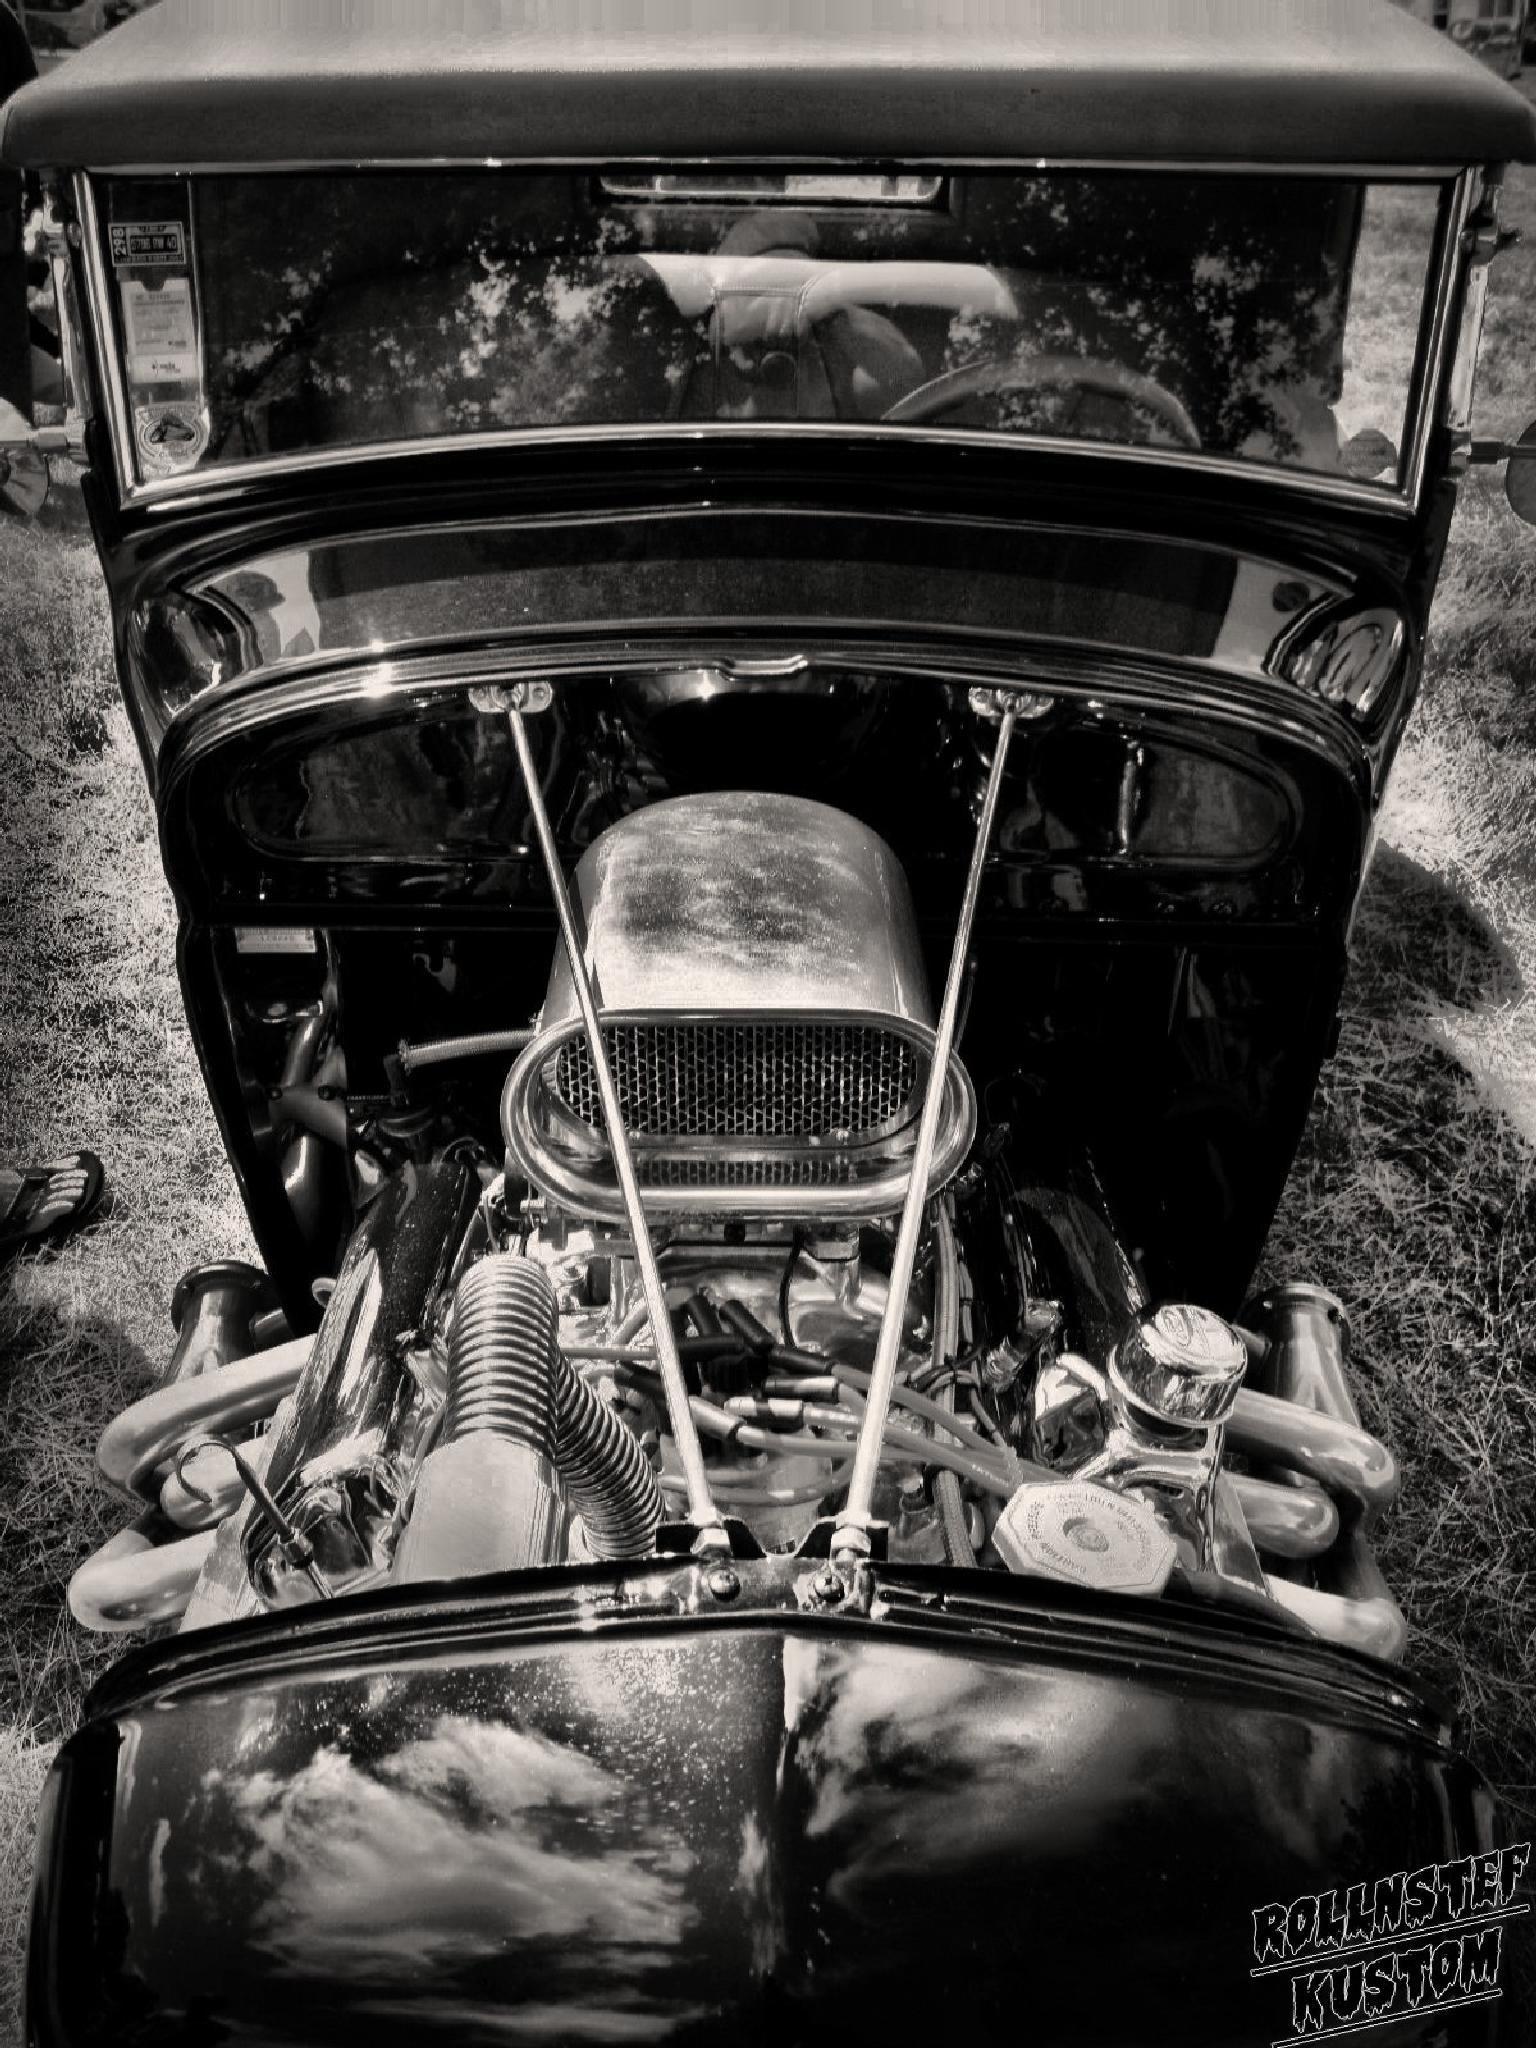 Rod Engine by rollnstef